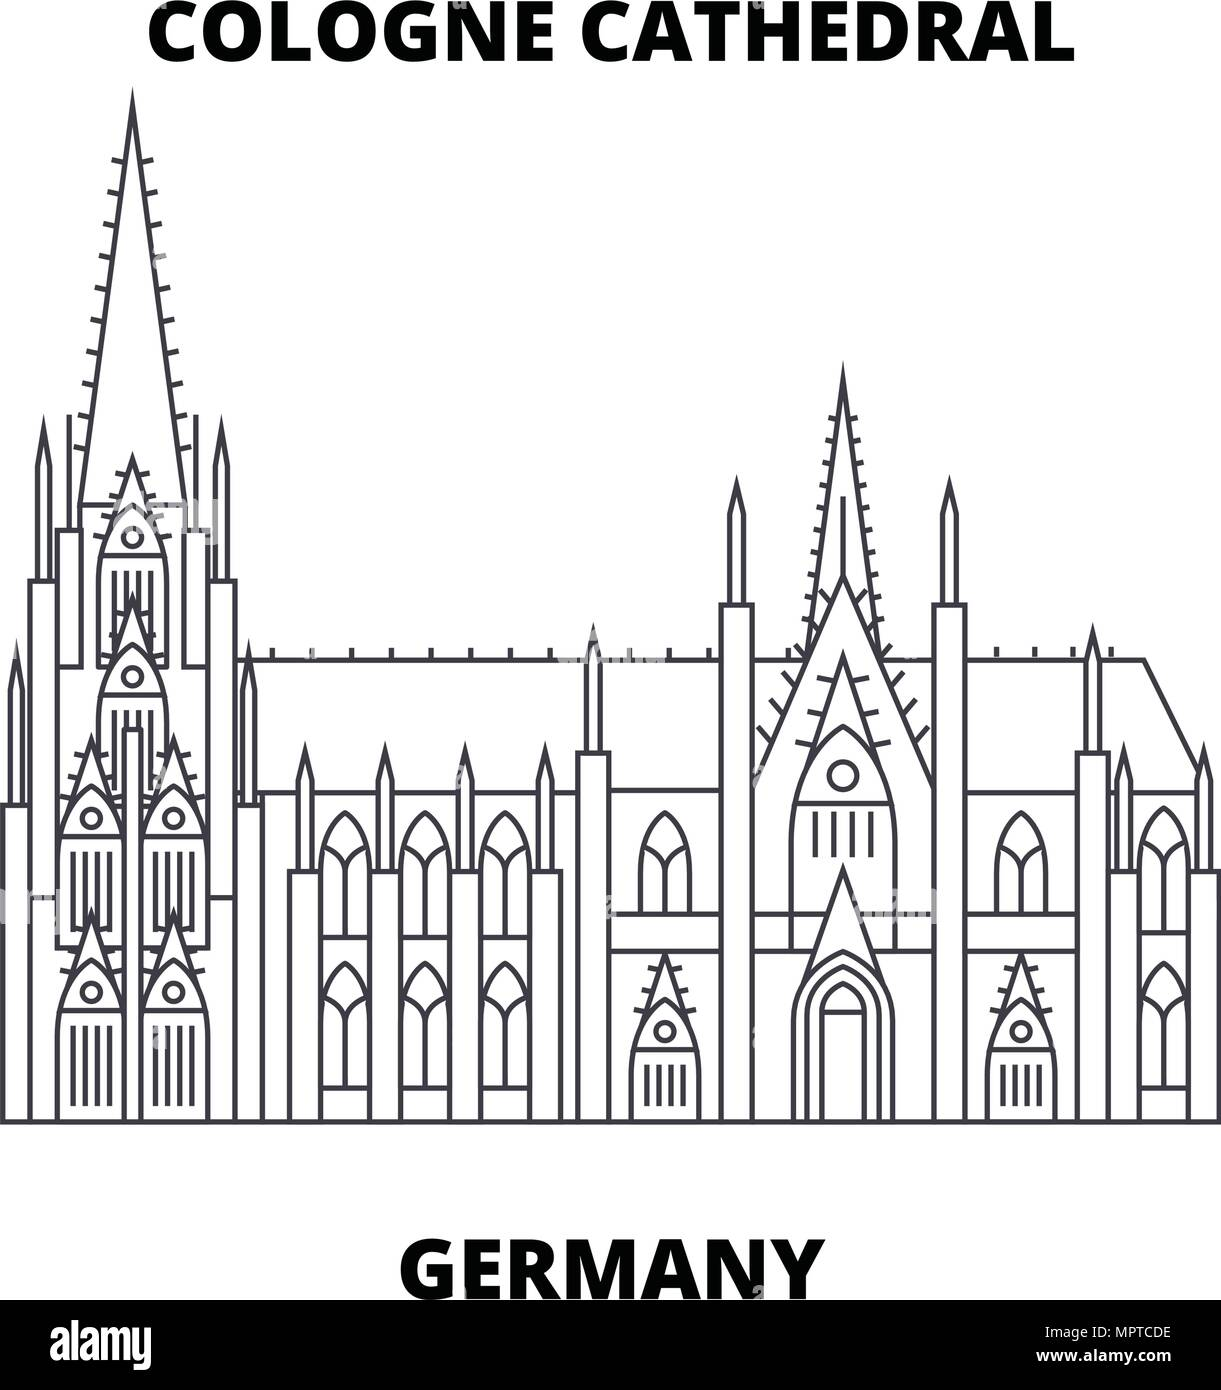 Kolner Dom Deutschland Symbol Leitung Konzept Kolner Dom Deutschland Linearvektor Zeichen Symbol Abbildung Stock Vektorgrafik Alamy